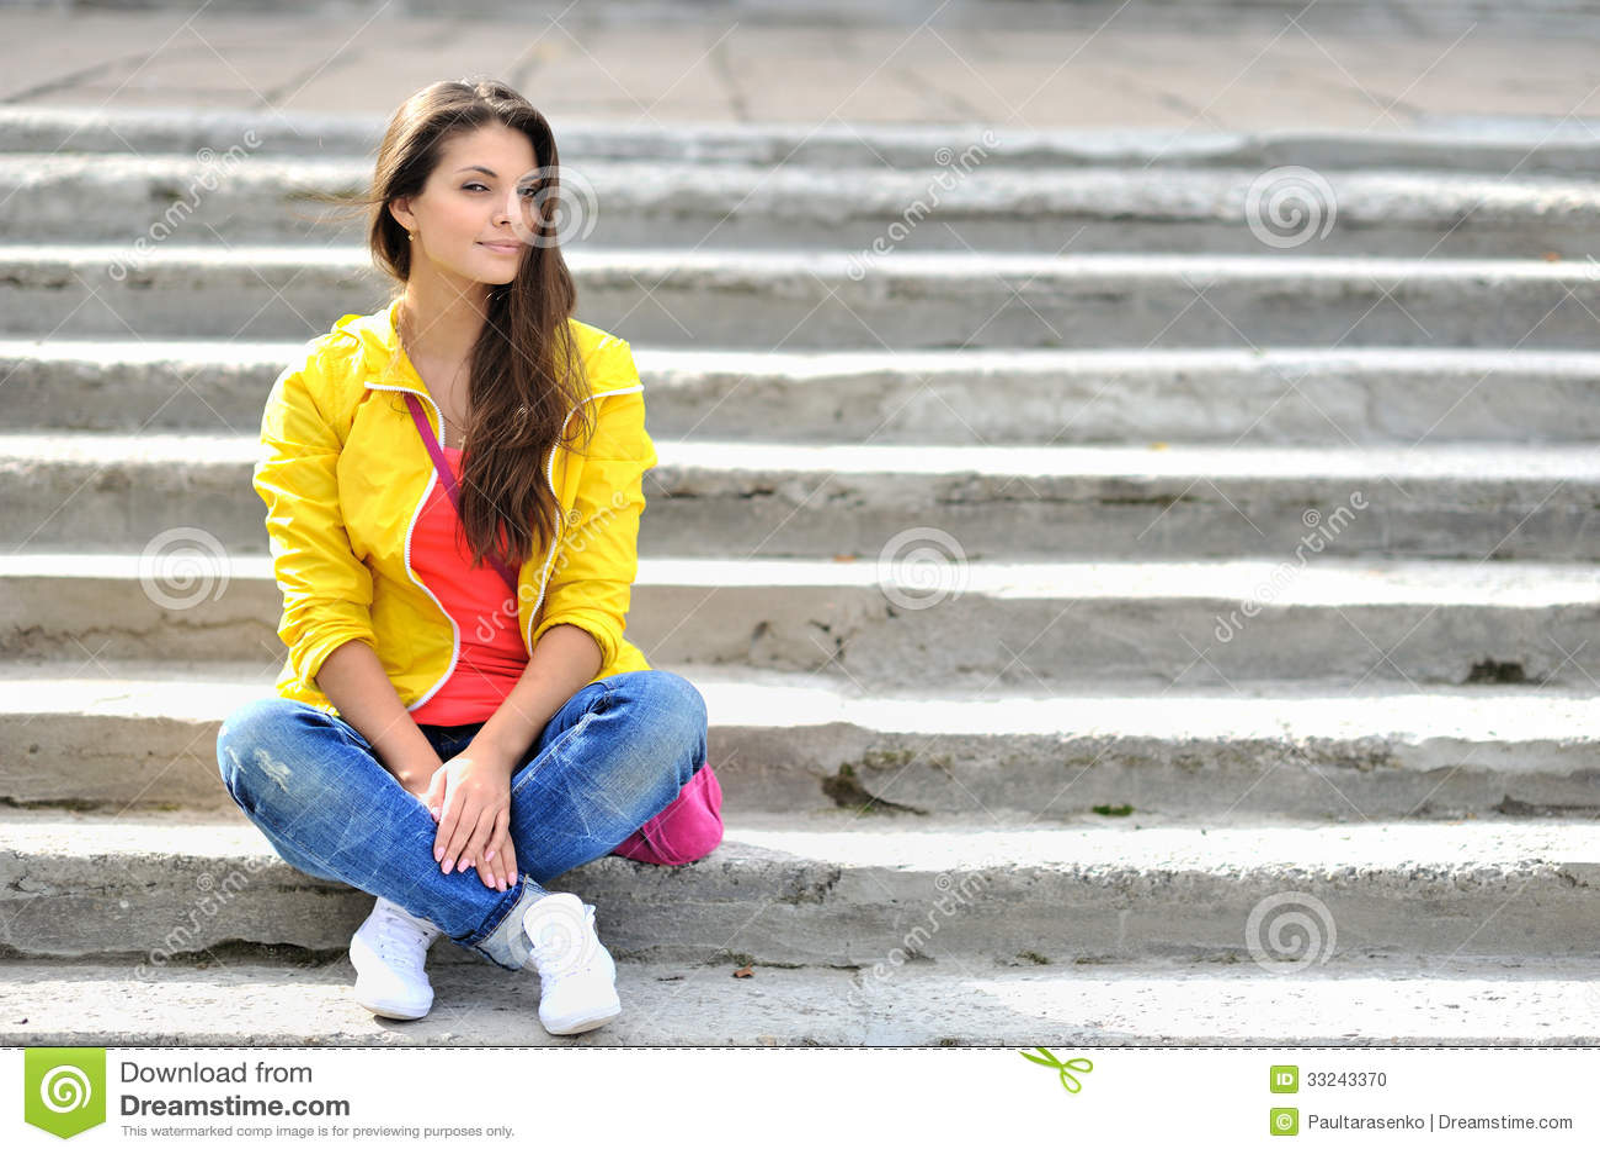 Fashion Girl Urban Style Portrait Outdoor Stock Photo